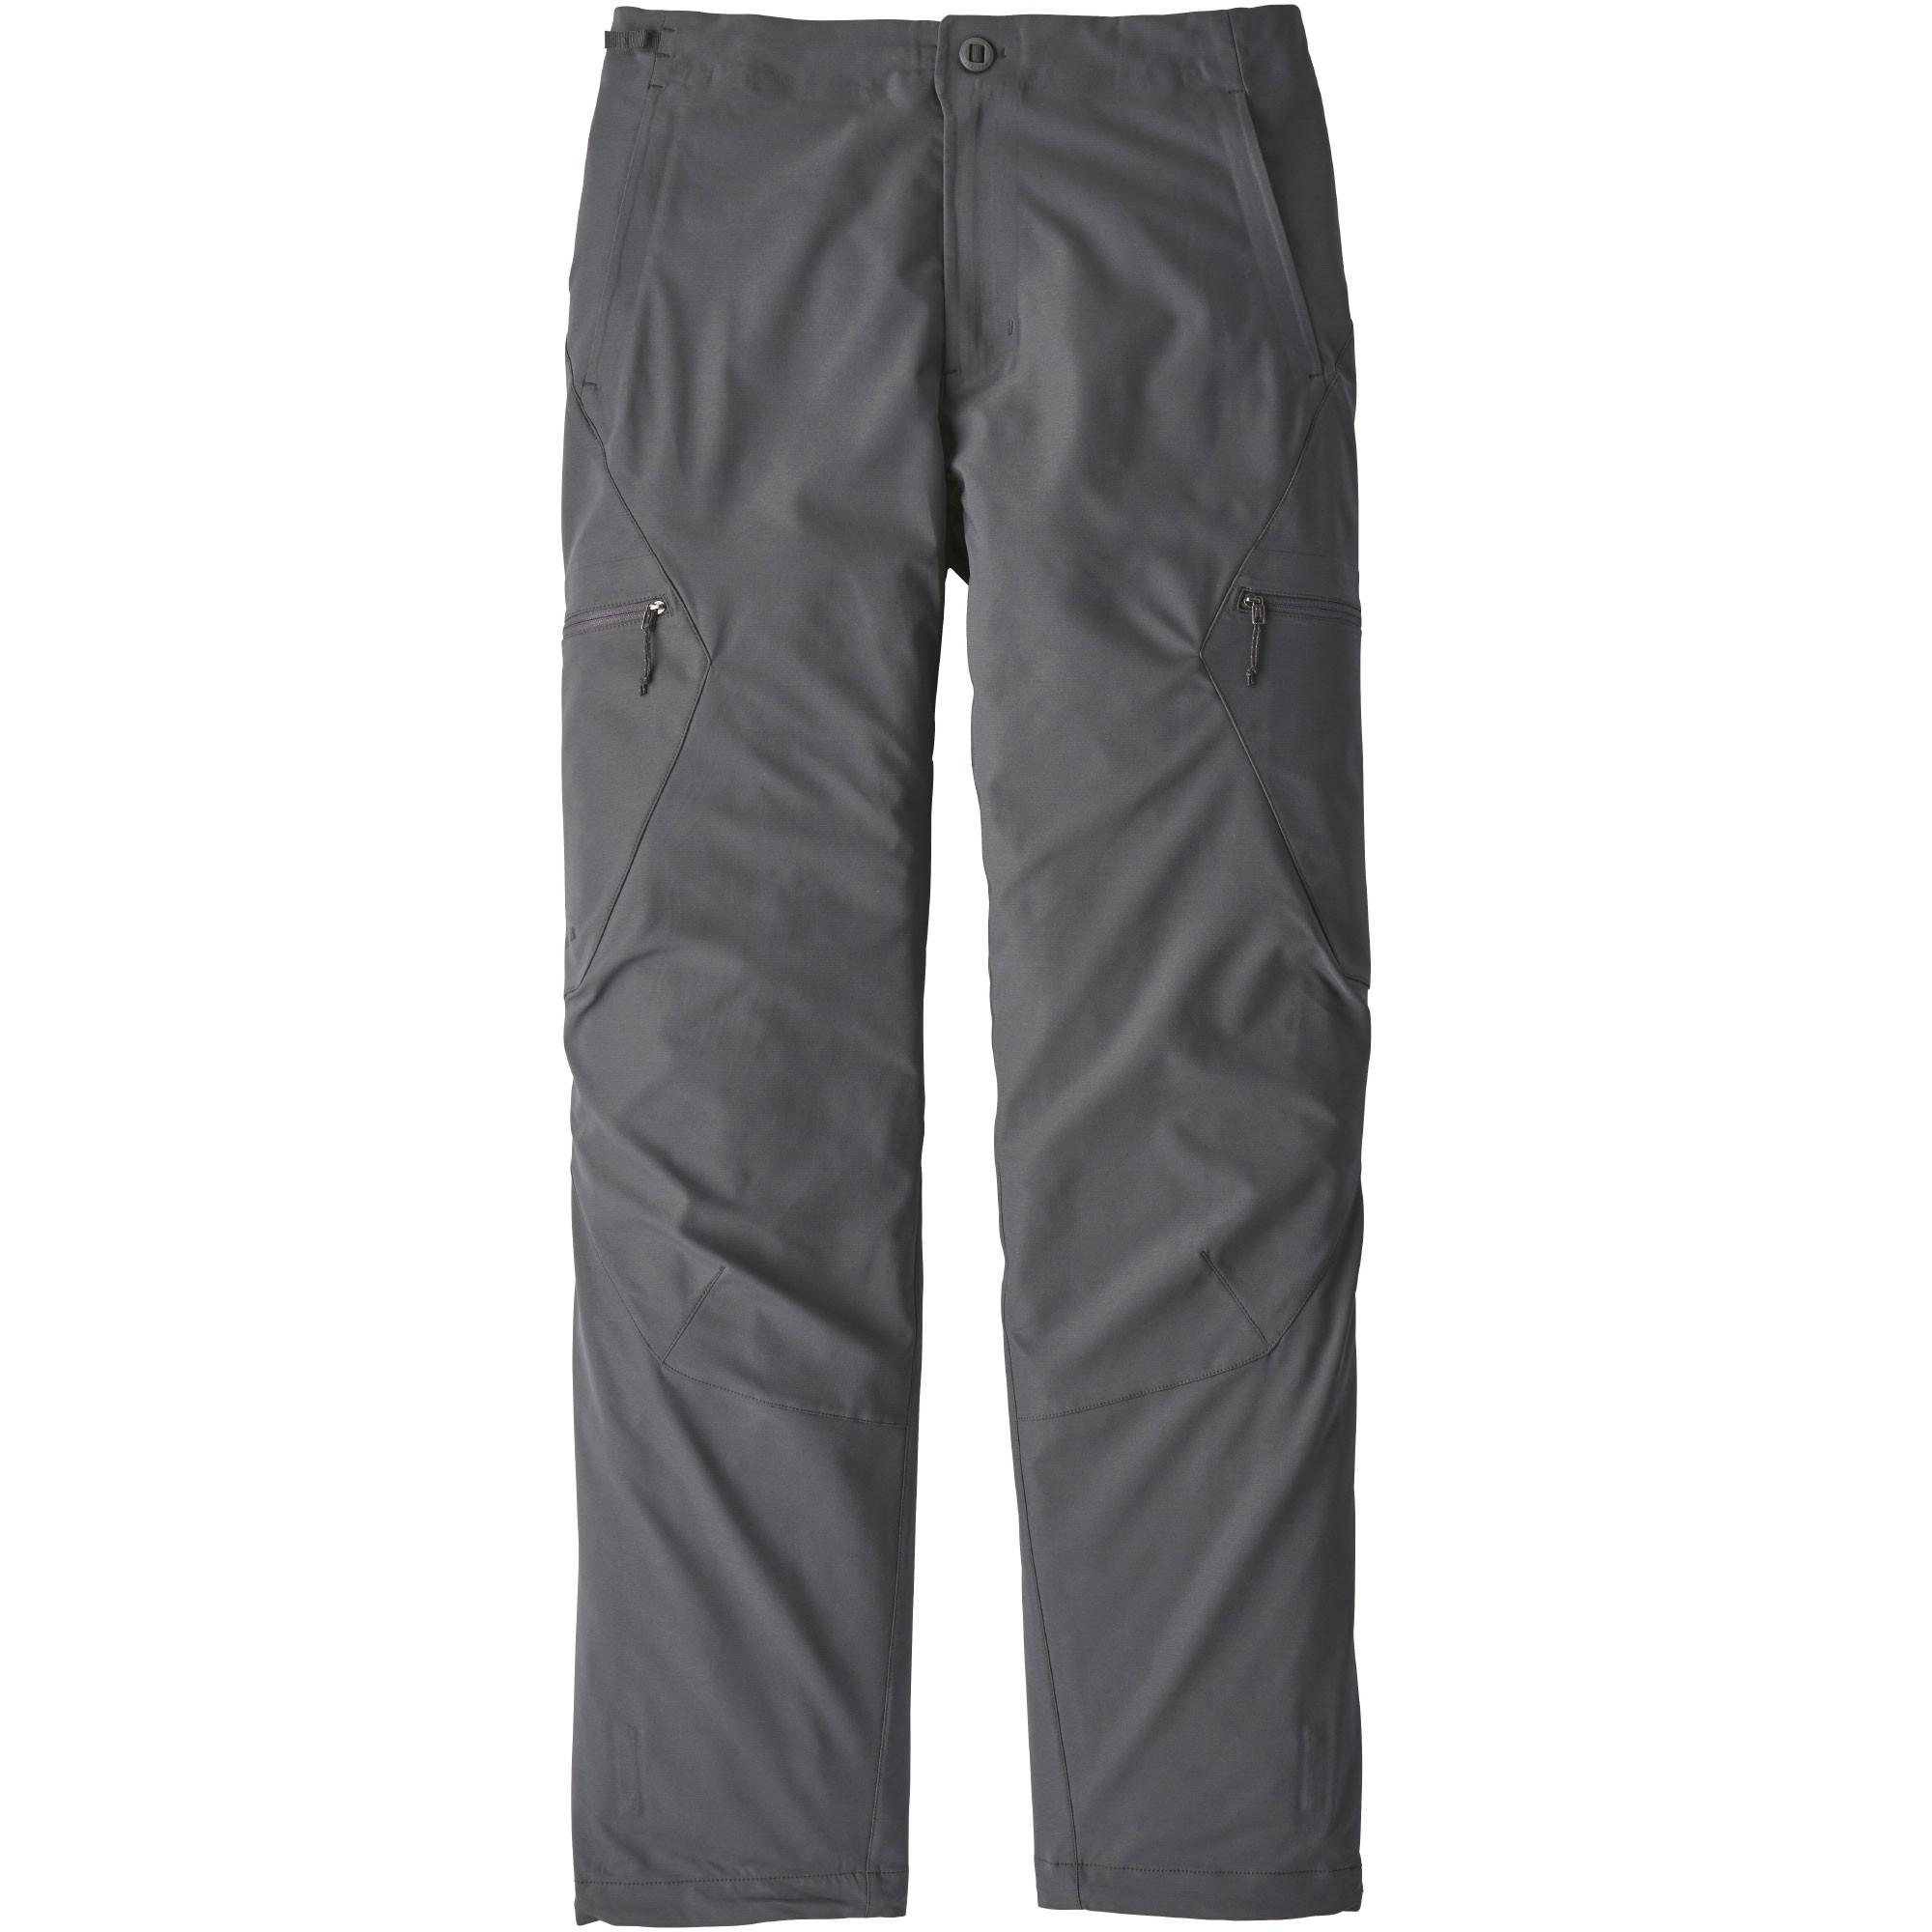 Patagonia Simul Alpine Softshell Pants - Forge Grey